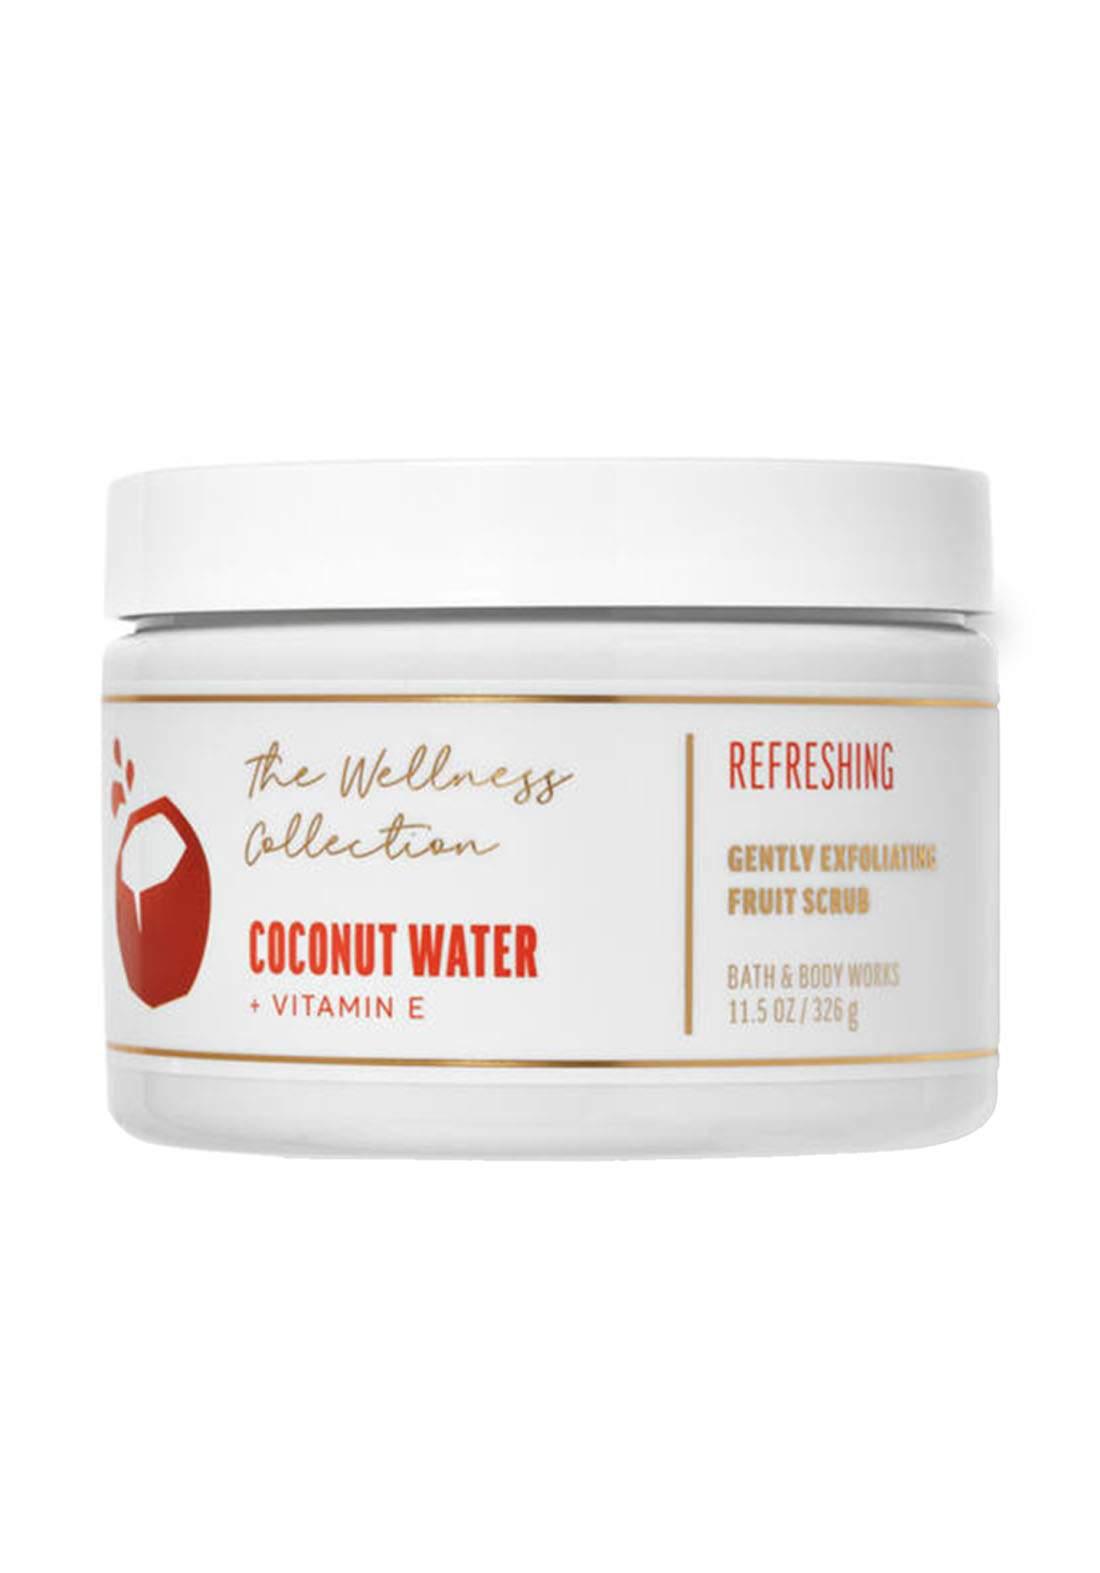 Bath And Body Works Coconut Water Gently Exfoliating Fruit Scrub 326g مقشر